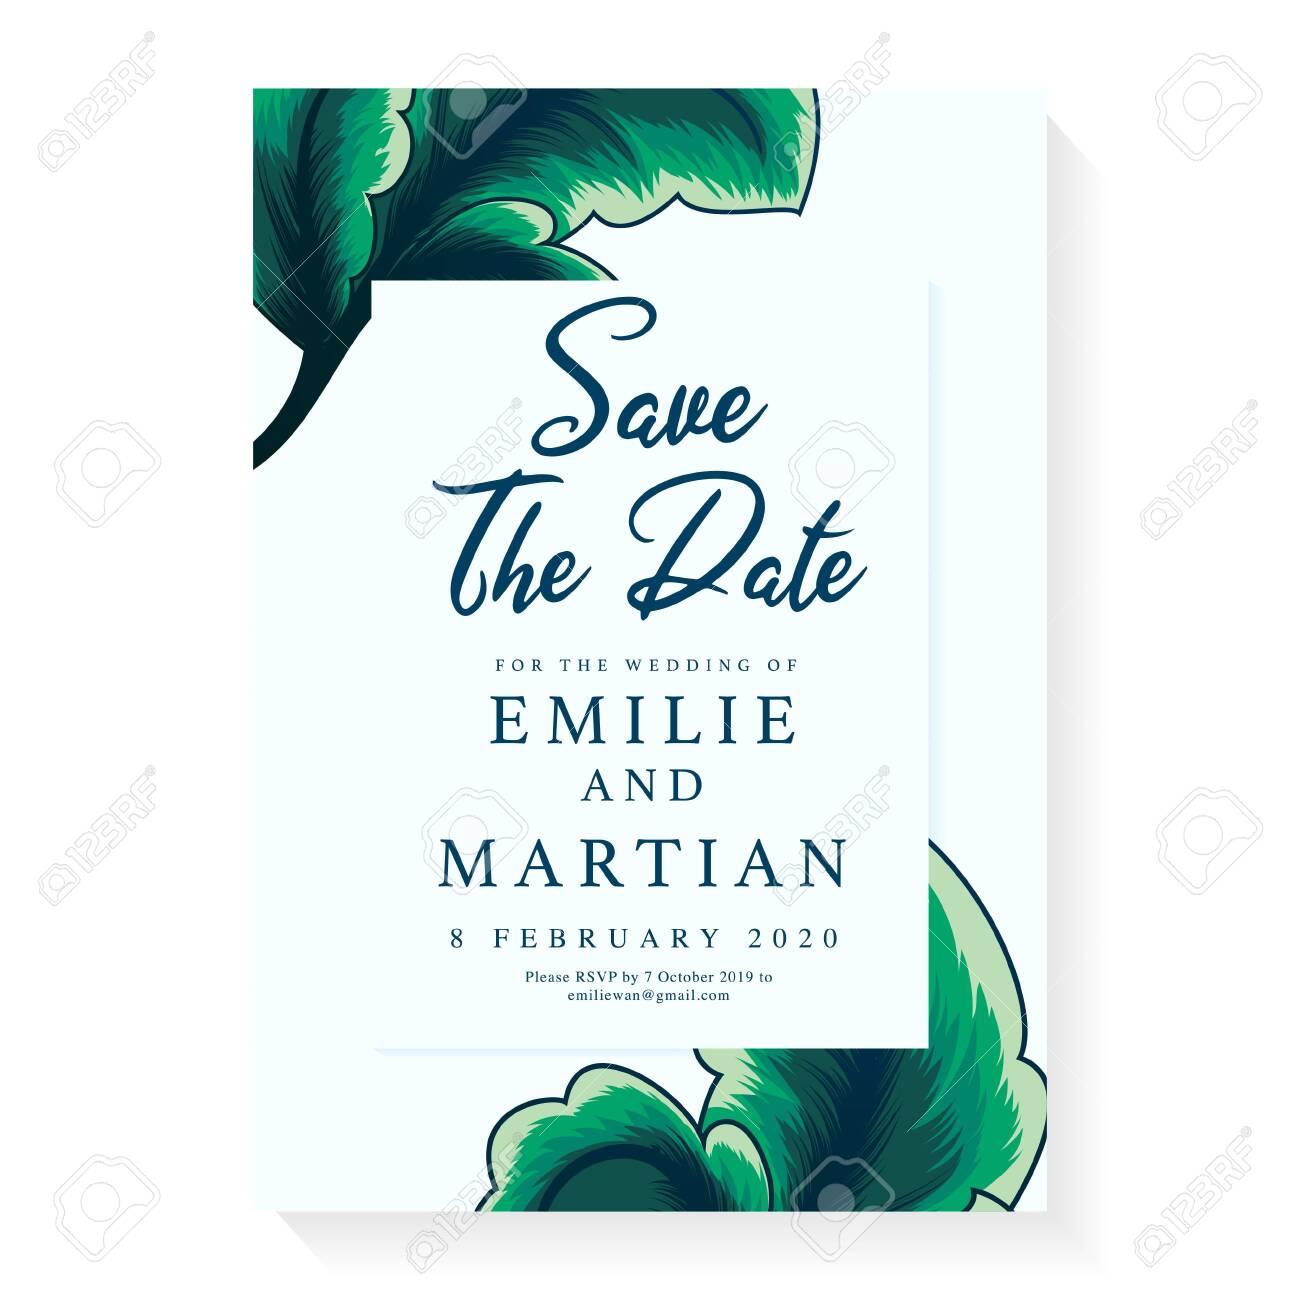 Minimalist Wedding Invitation Card Template Design Wedding Ornament